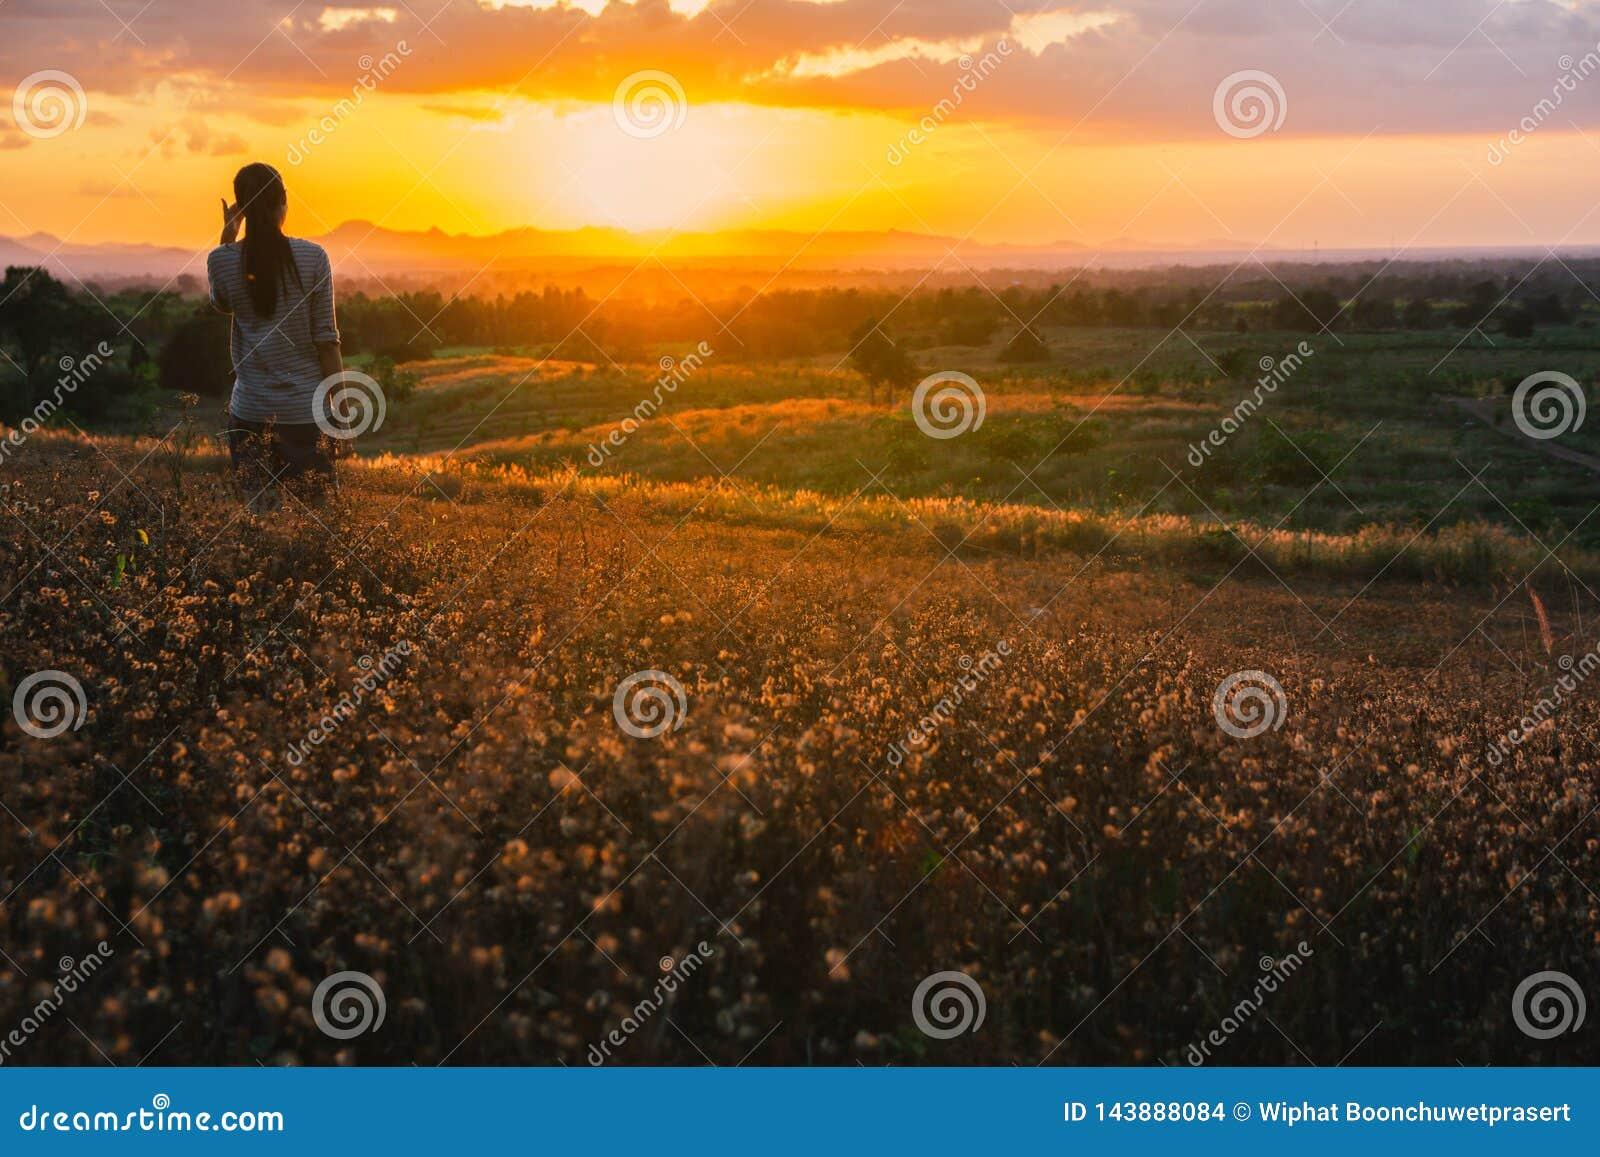 Happy Free Woman Enjoying Happiness Freedom And Nature Stock Photo Image Of Flowers Beautiful 143888084